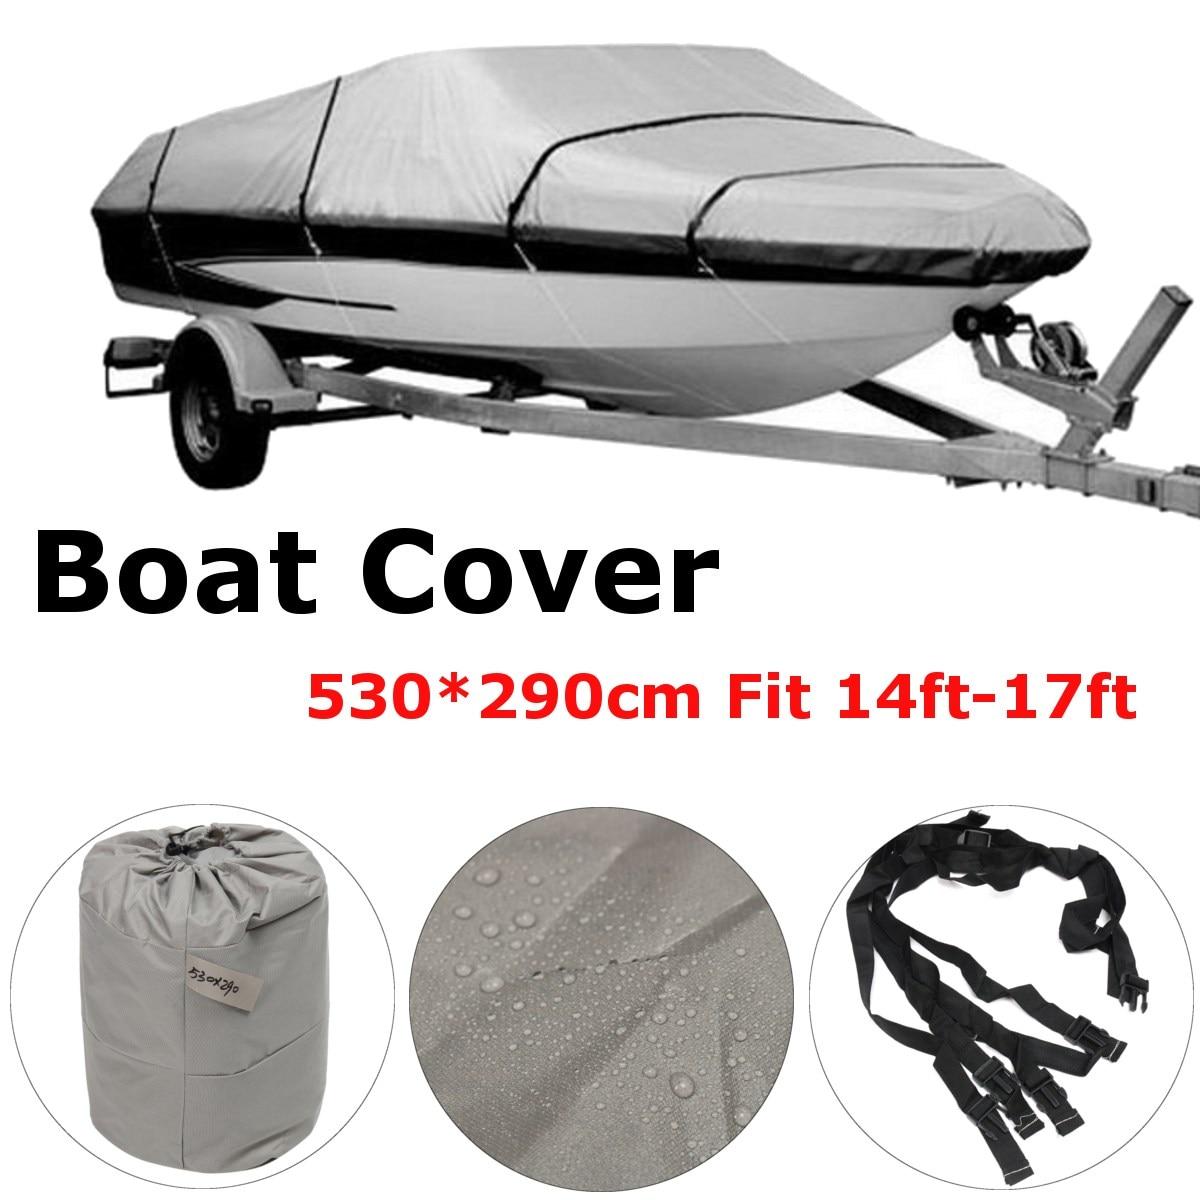 600D 14-17Ft Waterproof Heavy Duty Fabric Trailerable V shape Boat Cover Gray